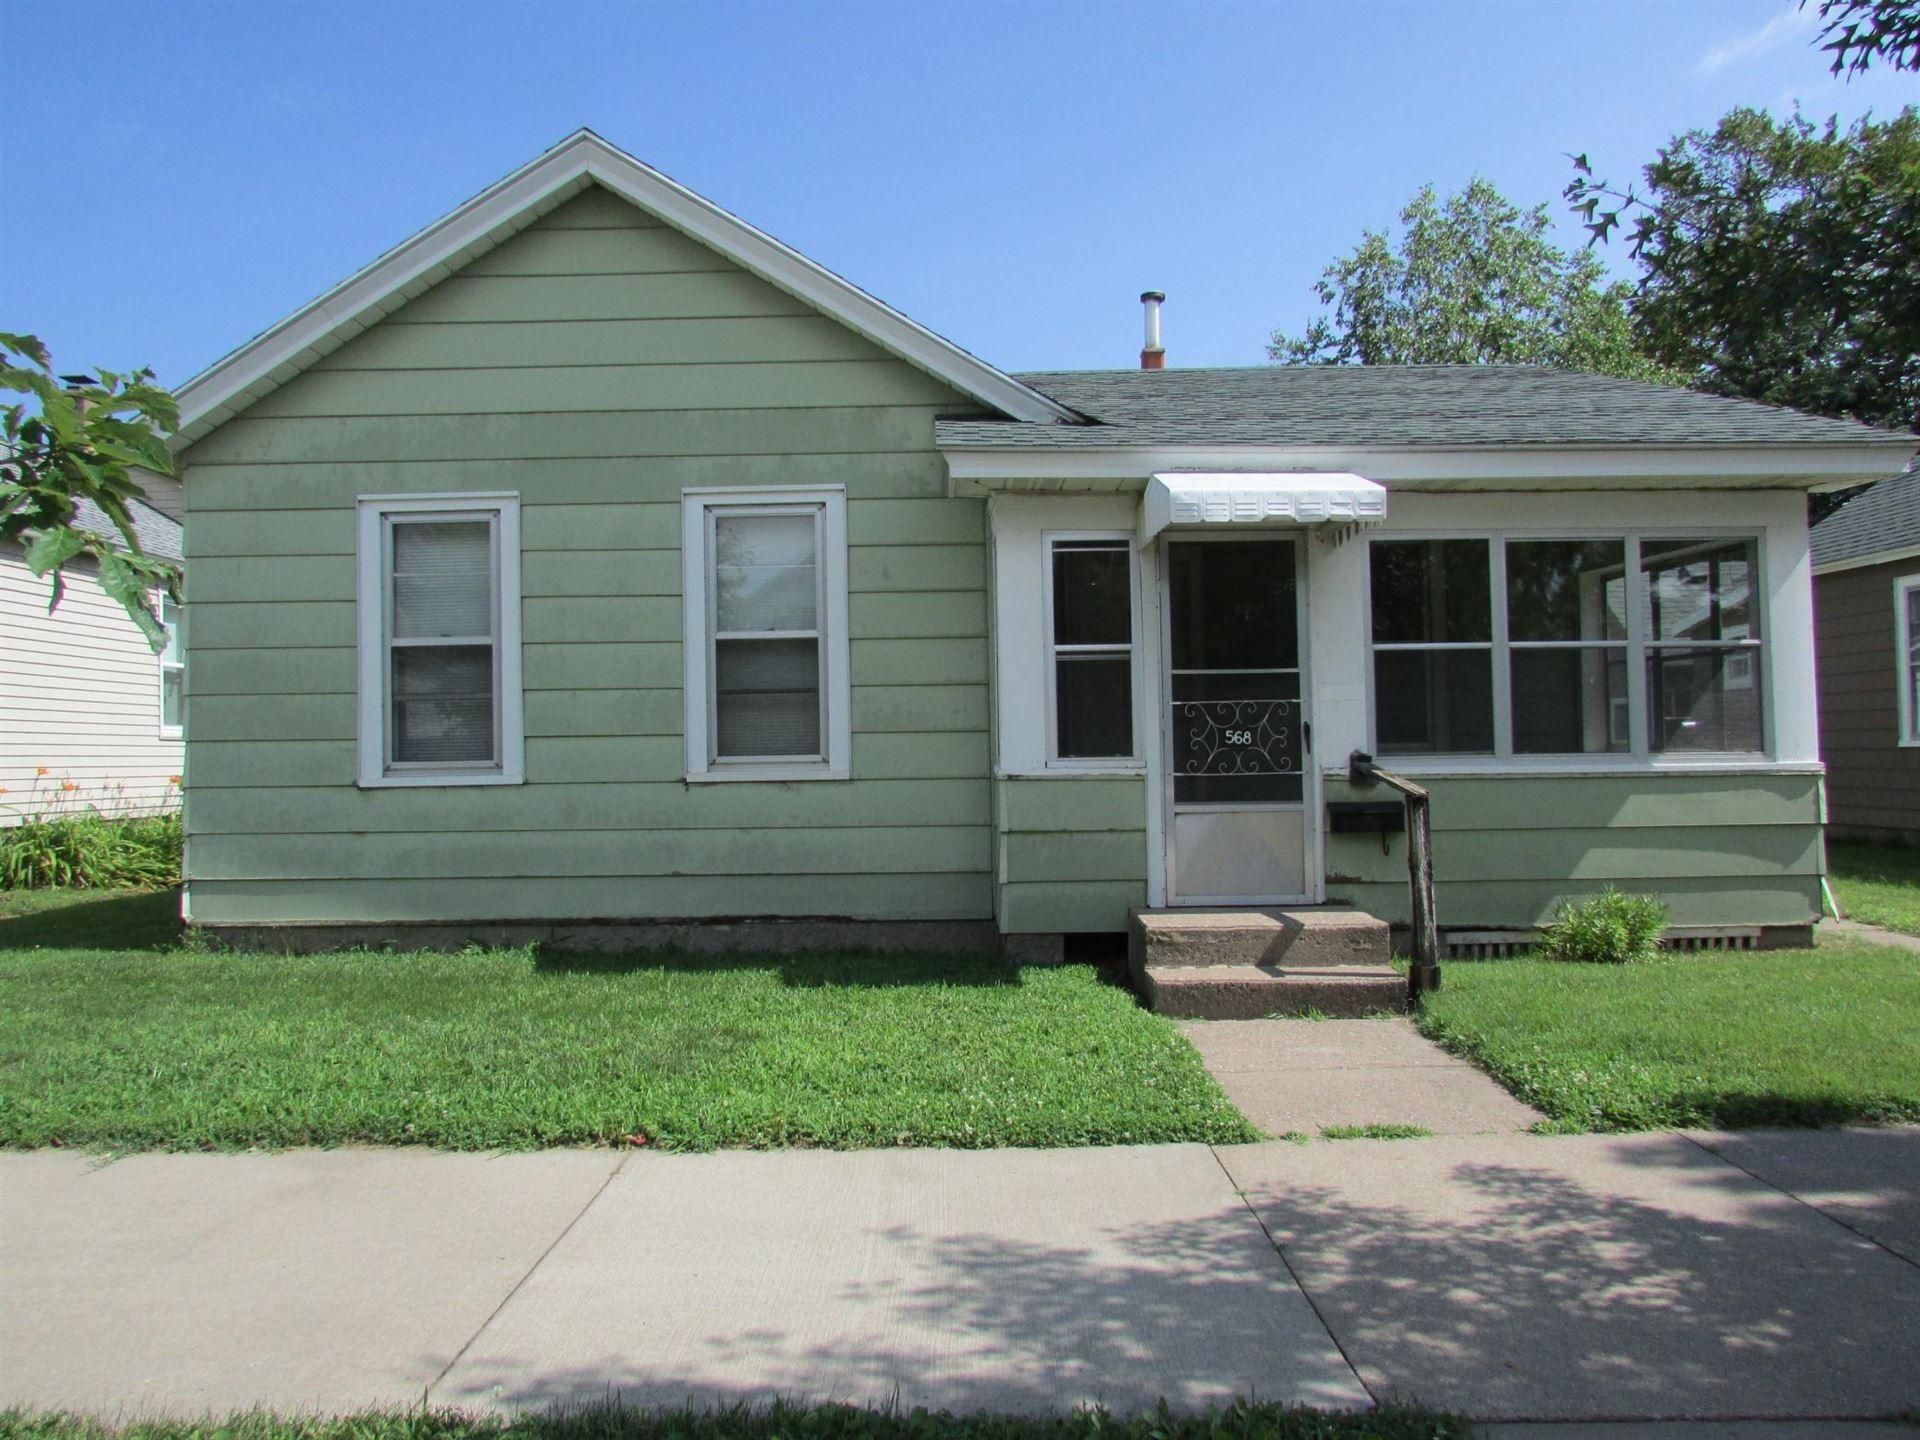 568 E 2nd Street, Winona, MN 55987 - MLS#: 6068757